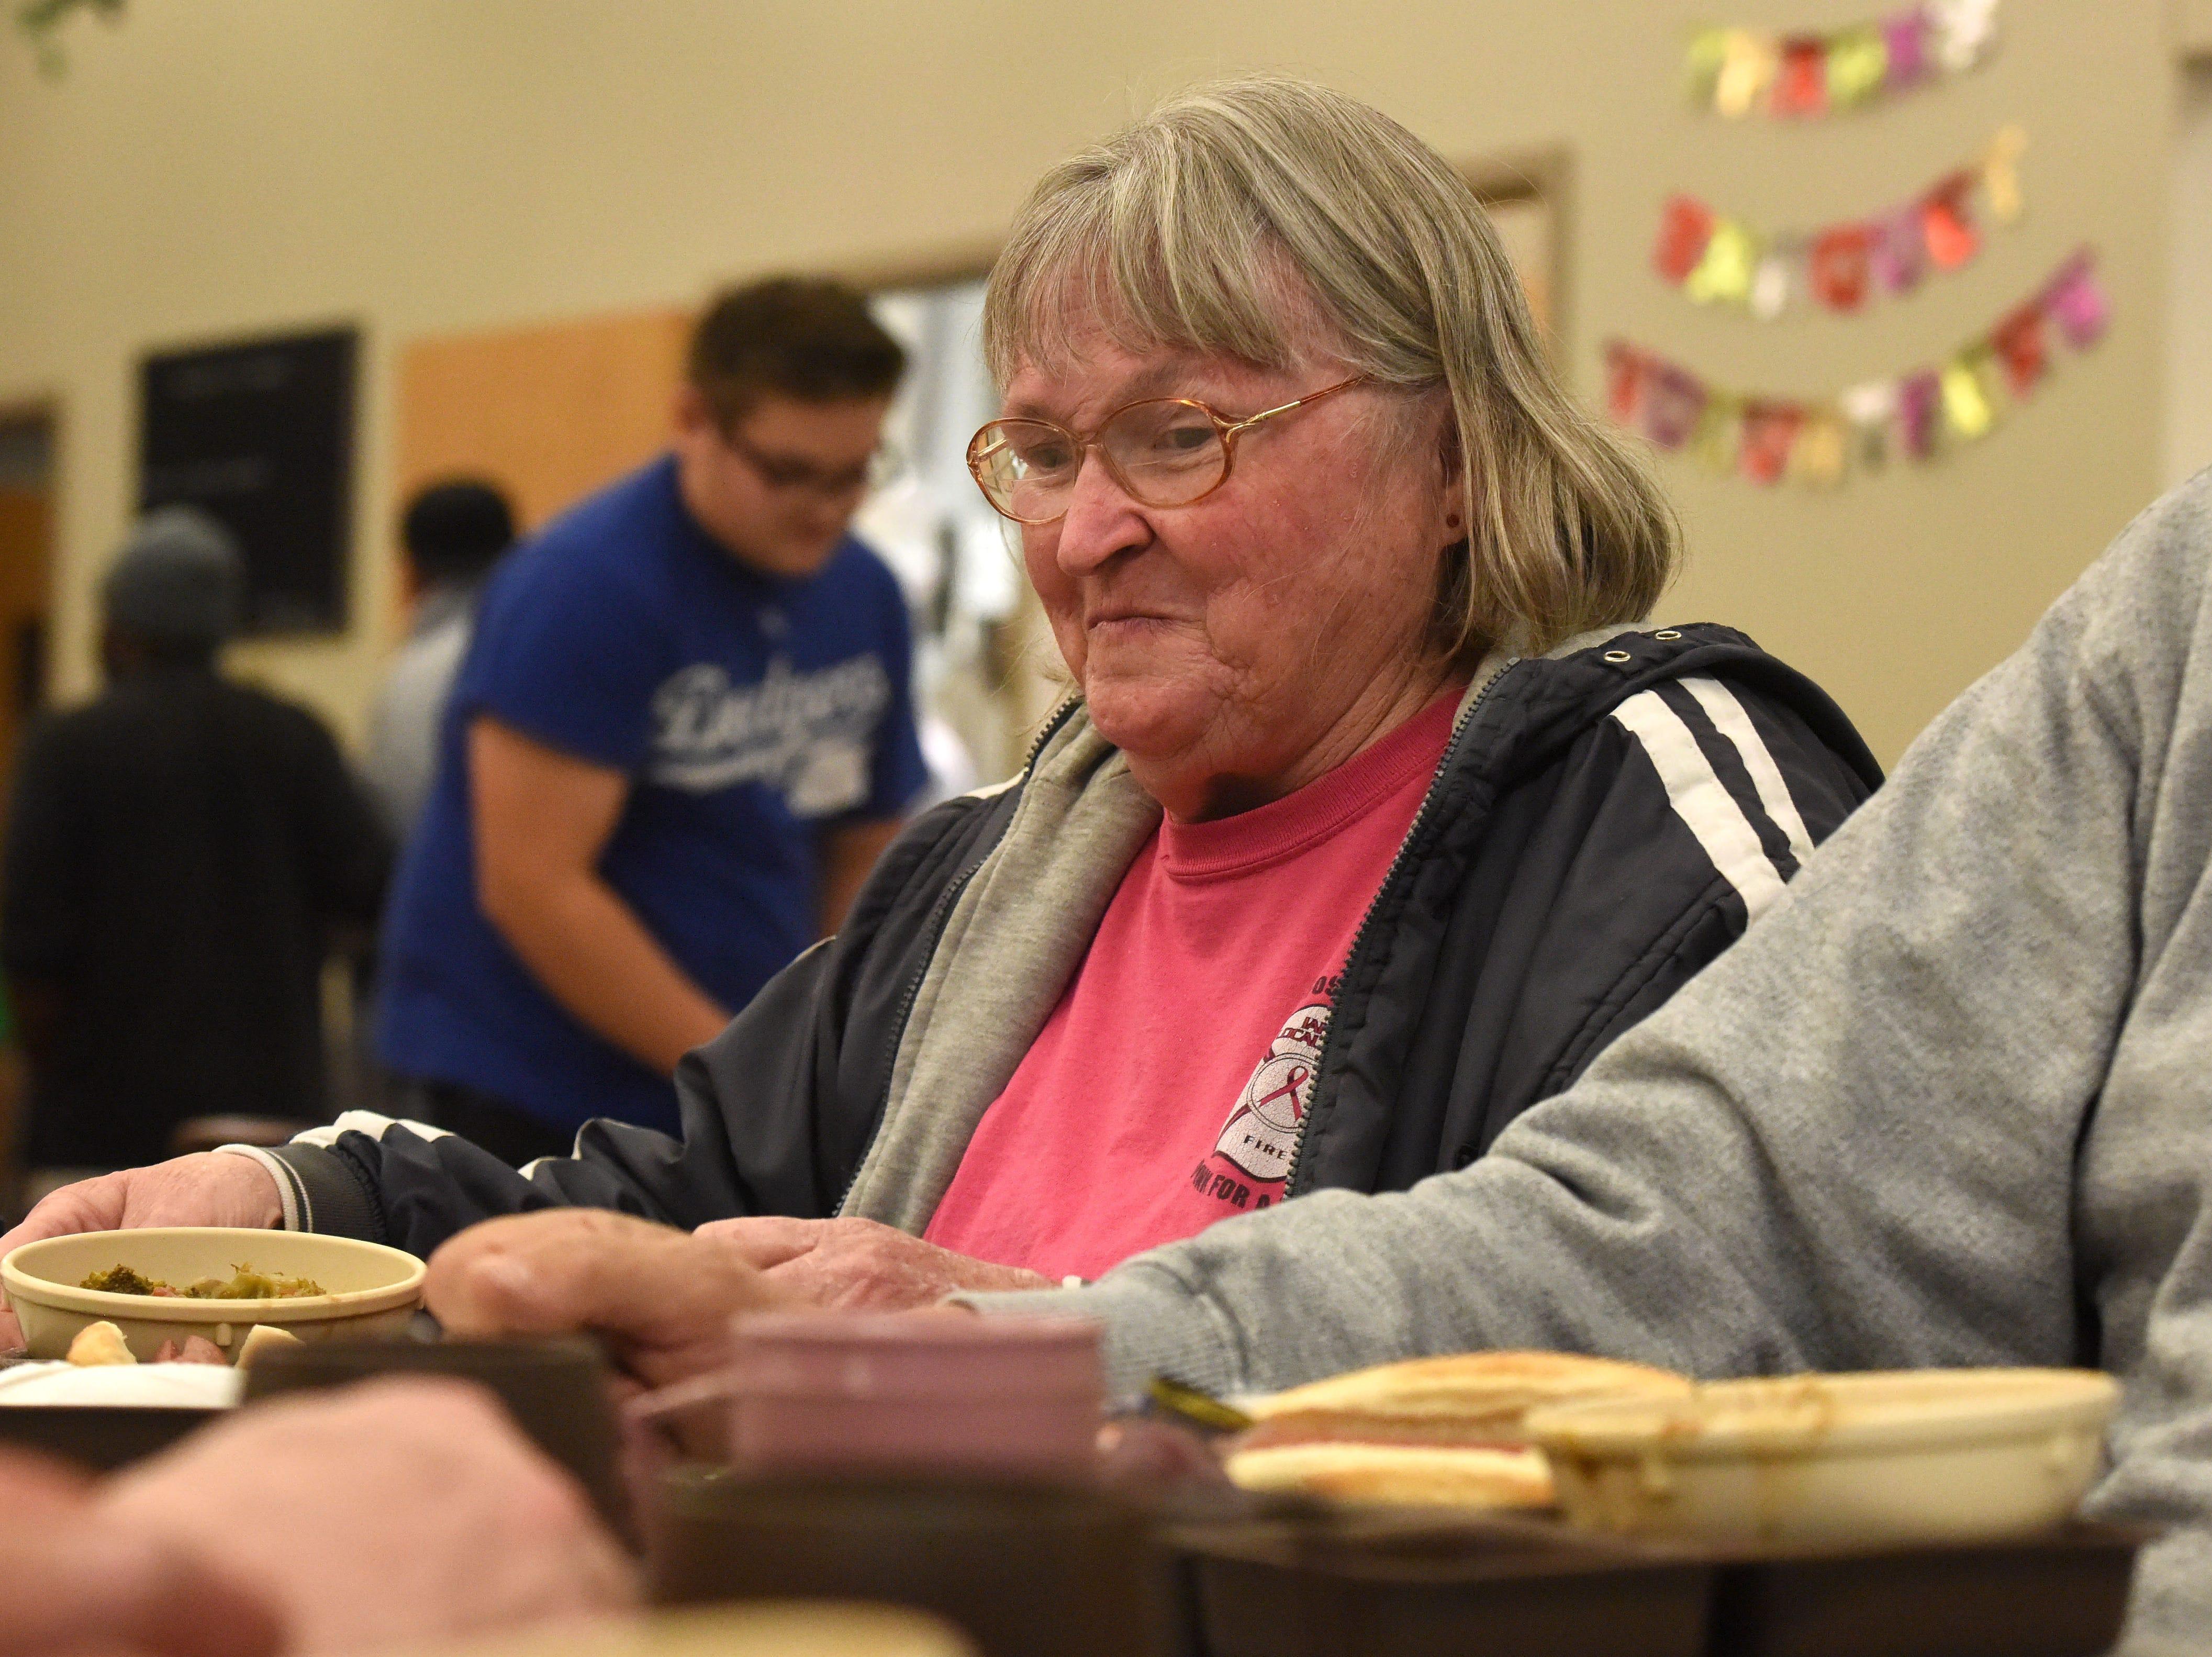 Audrey Jensen eats at The Banquet, Thursday, Nov. 1, 2018 in Sioux Falls, S.D.